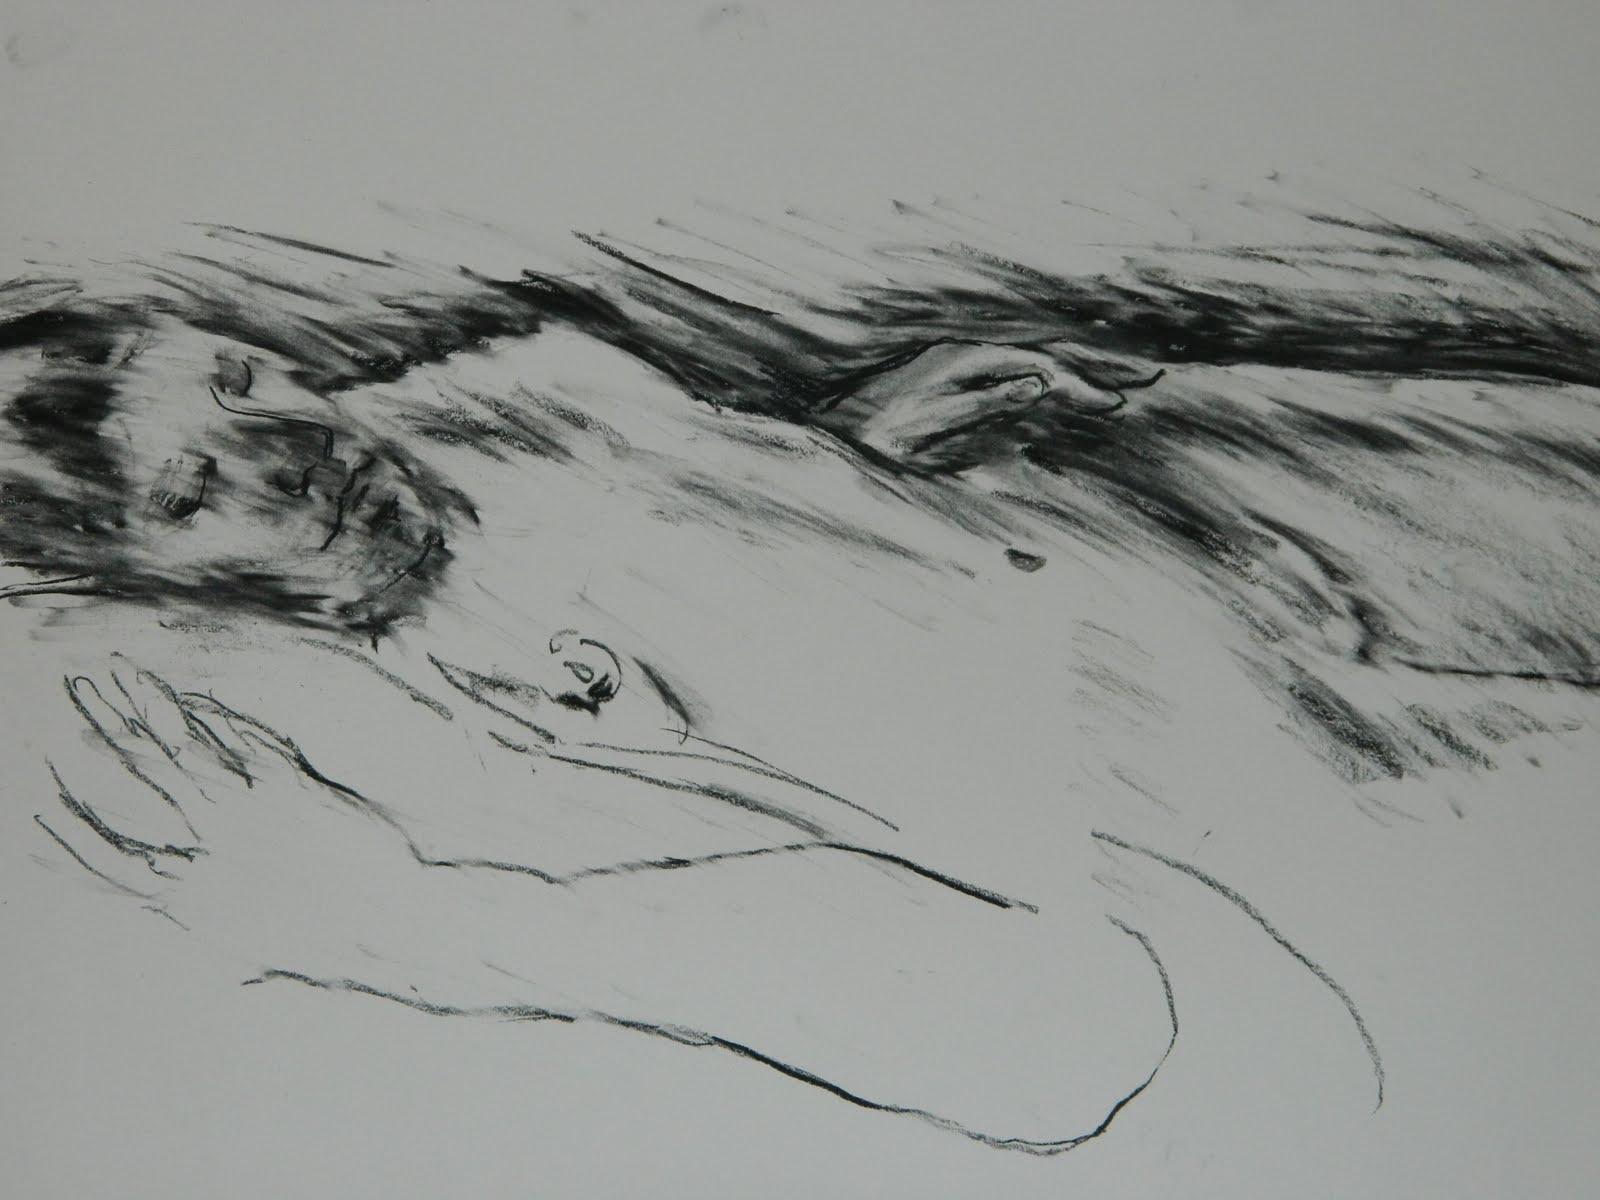 One Line Artist Statement : Line and texture artist statement drawing